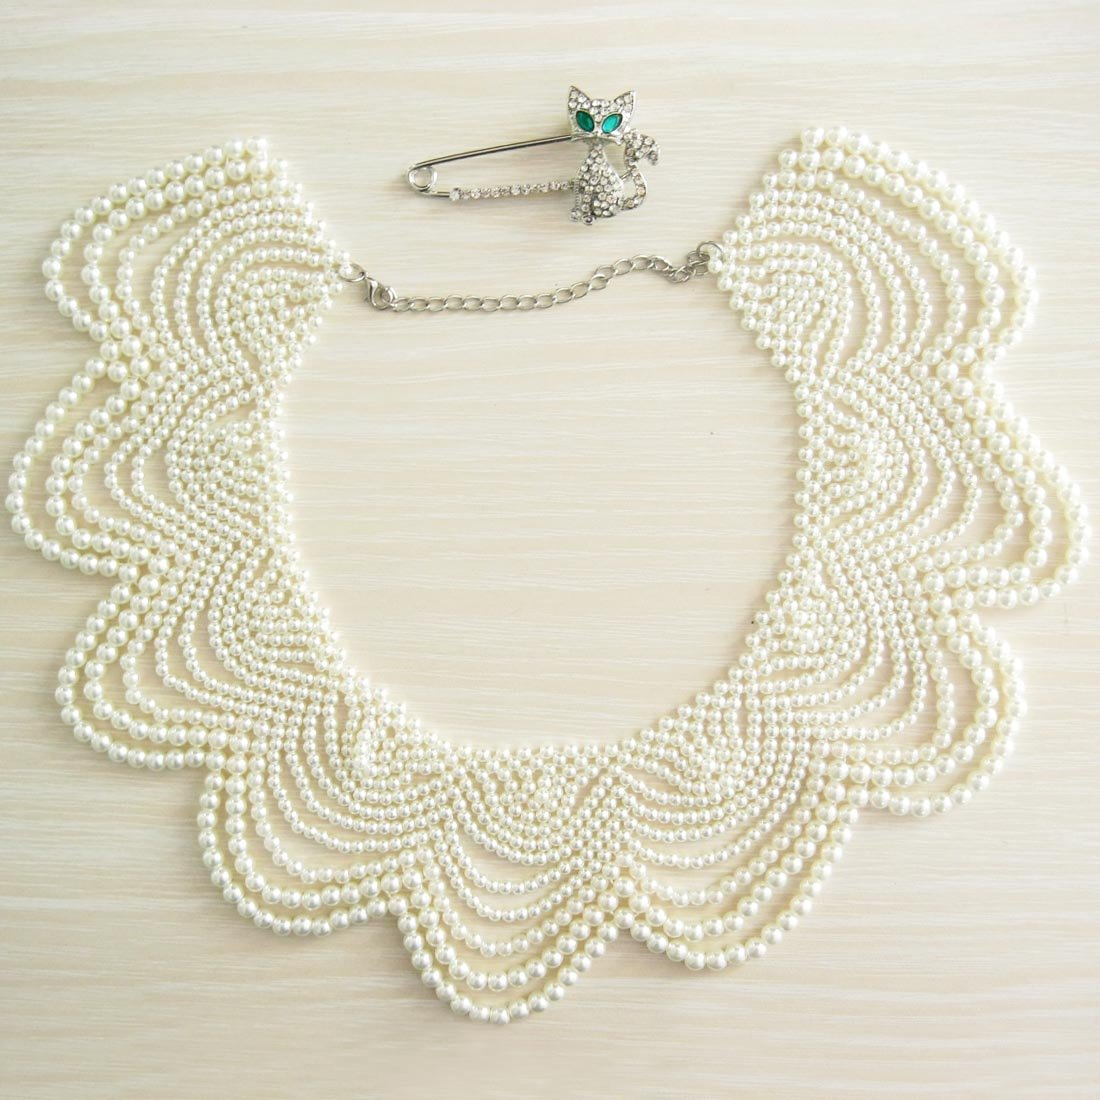 kilofly White Faux Pearl False Collar Necklace, Yoyo, with Rhinestone Cat Pin